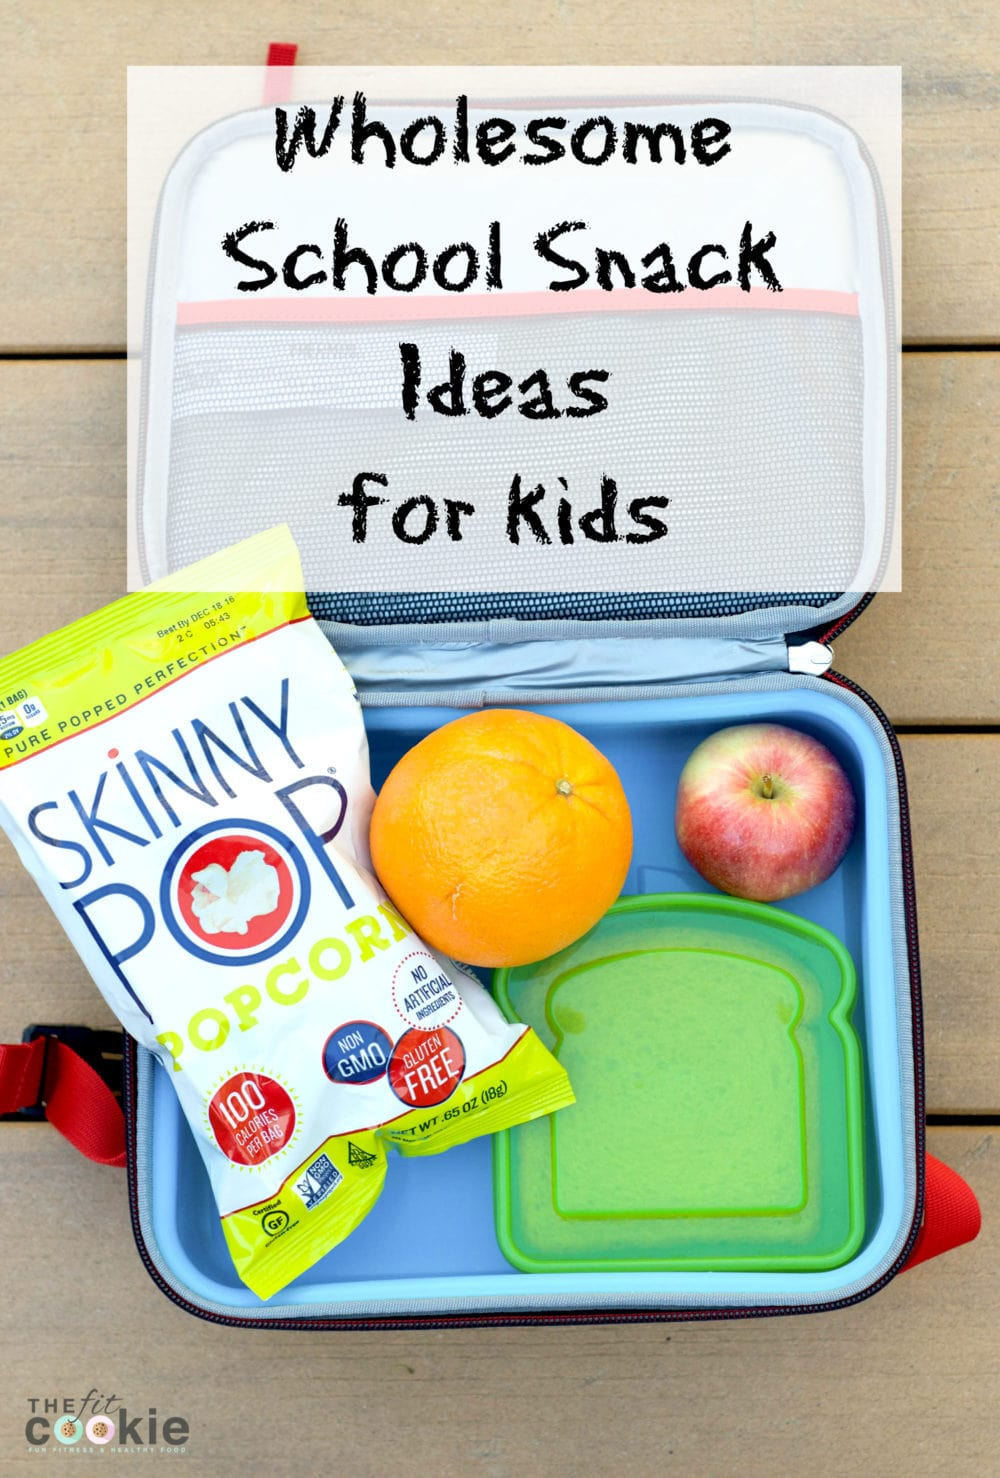 Wholesome School Snack Ideas for Kids (& Nut-Free!) - @thefitcookie #ad @TheSkinnyPop #SkinnyPopB2S #snacks #school